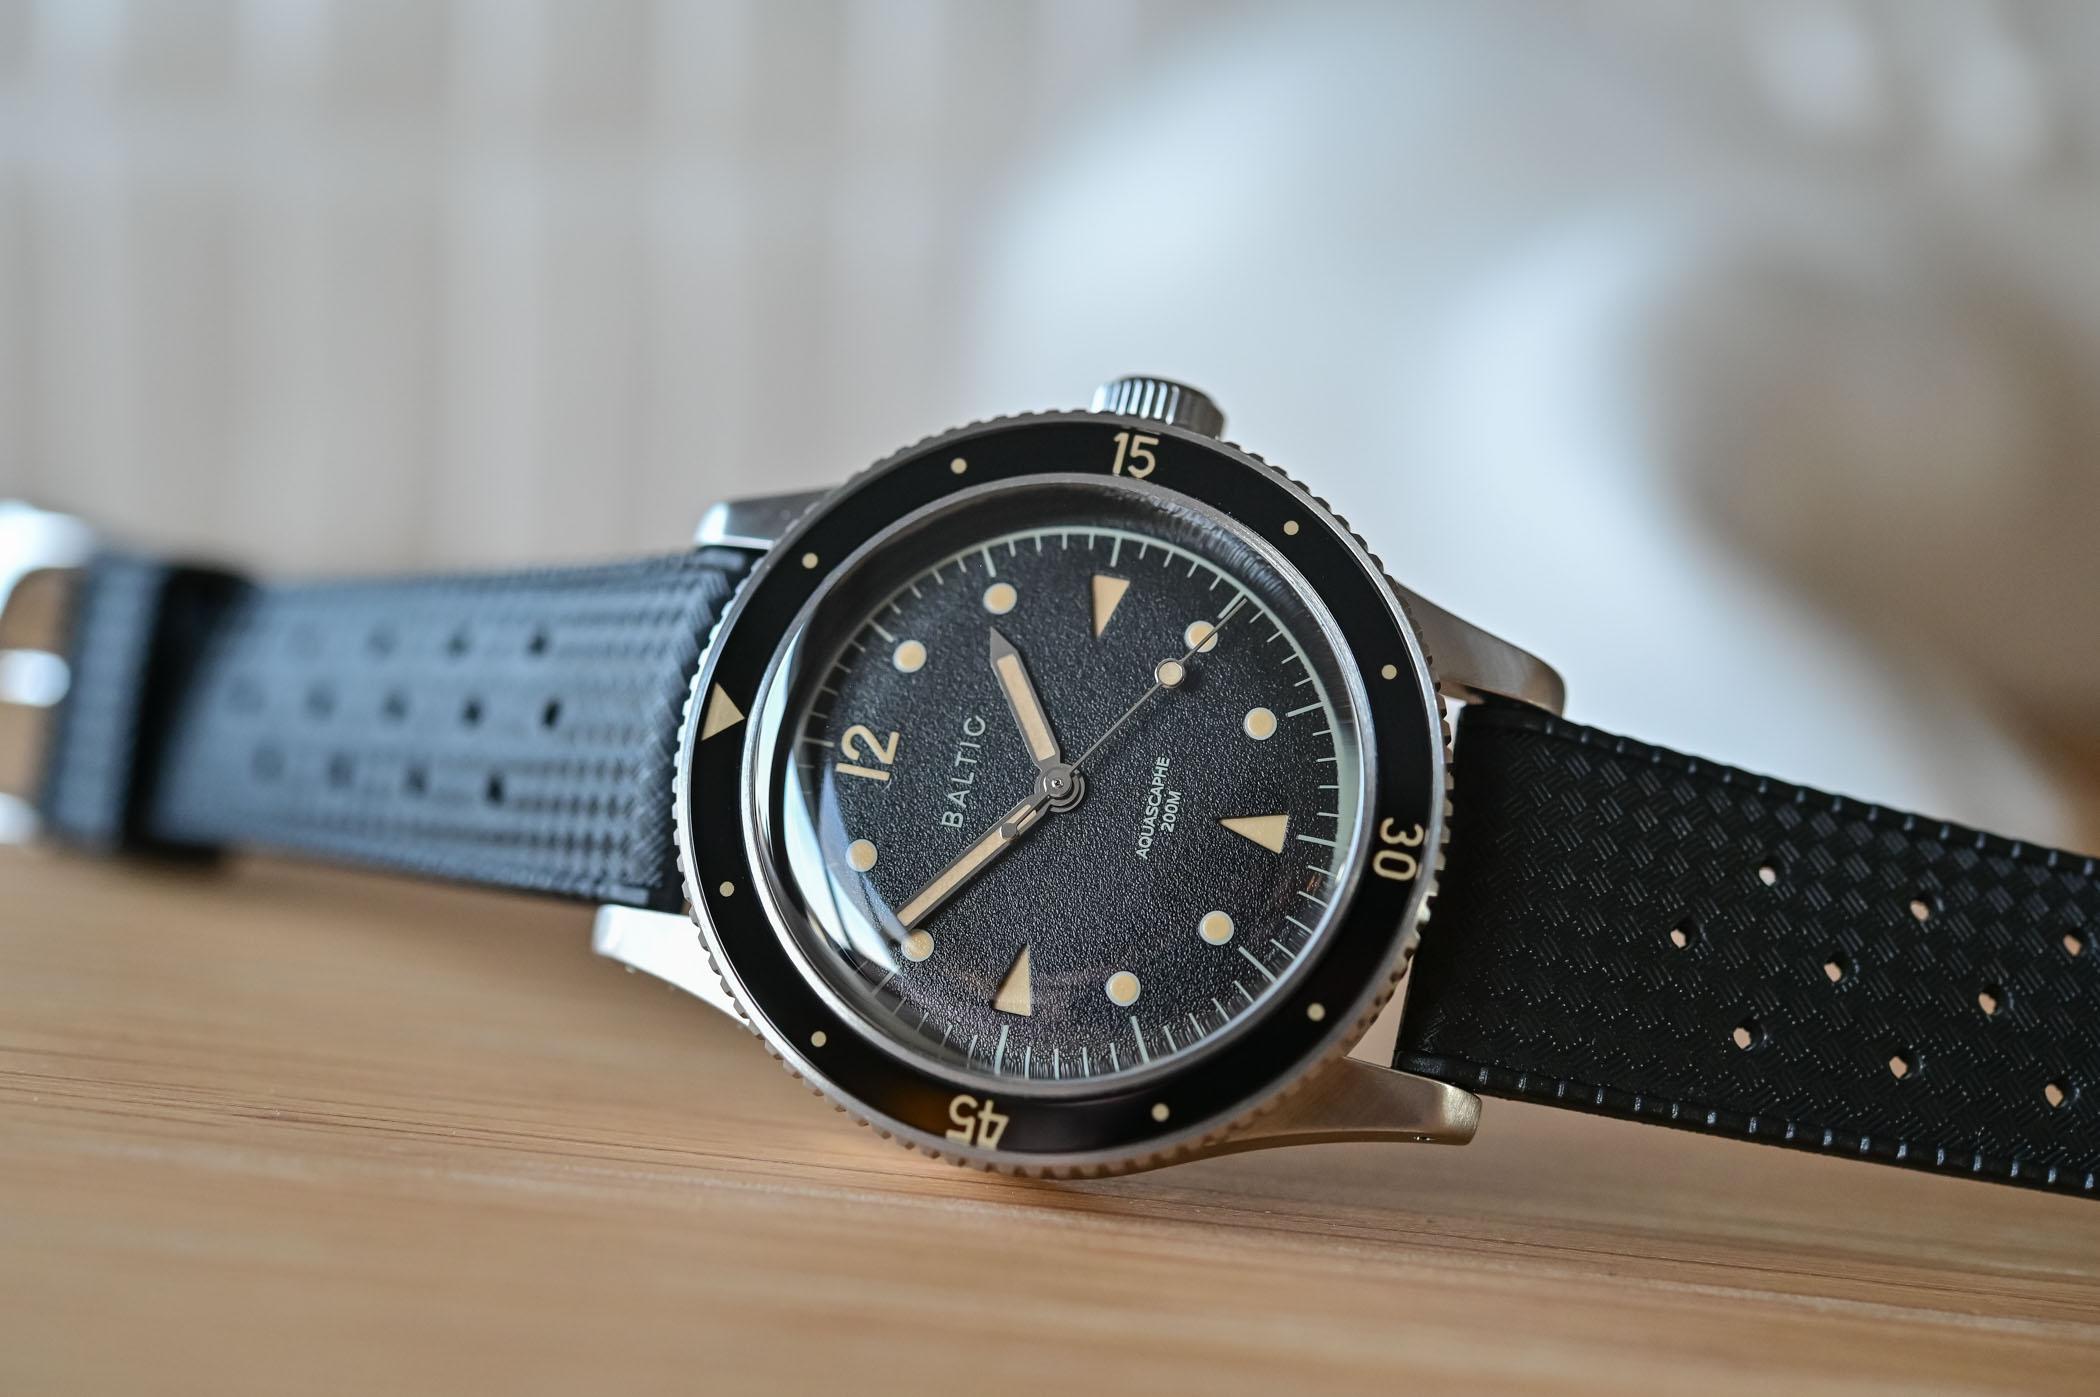 Baltic-Aquascaphe-Dive-Watch-Review-7.jpg